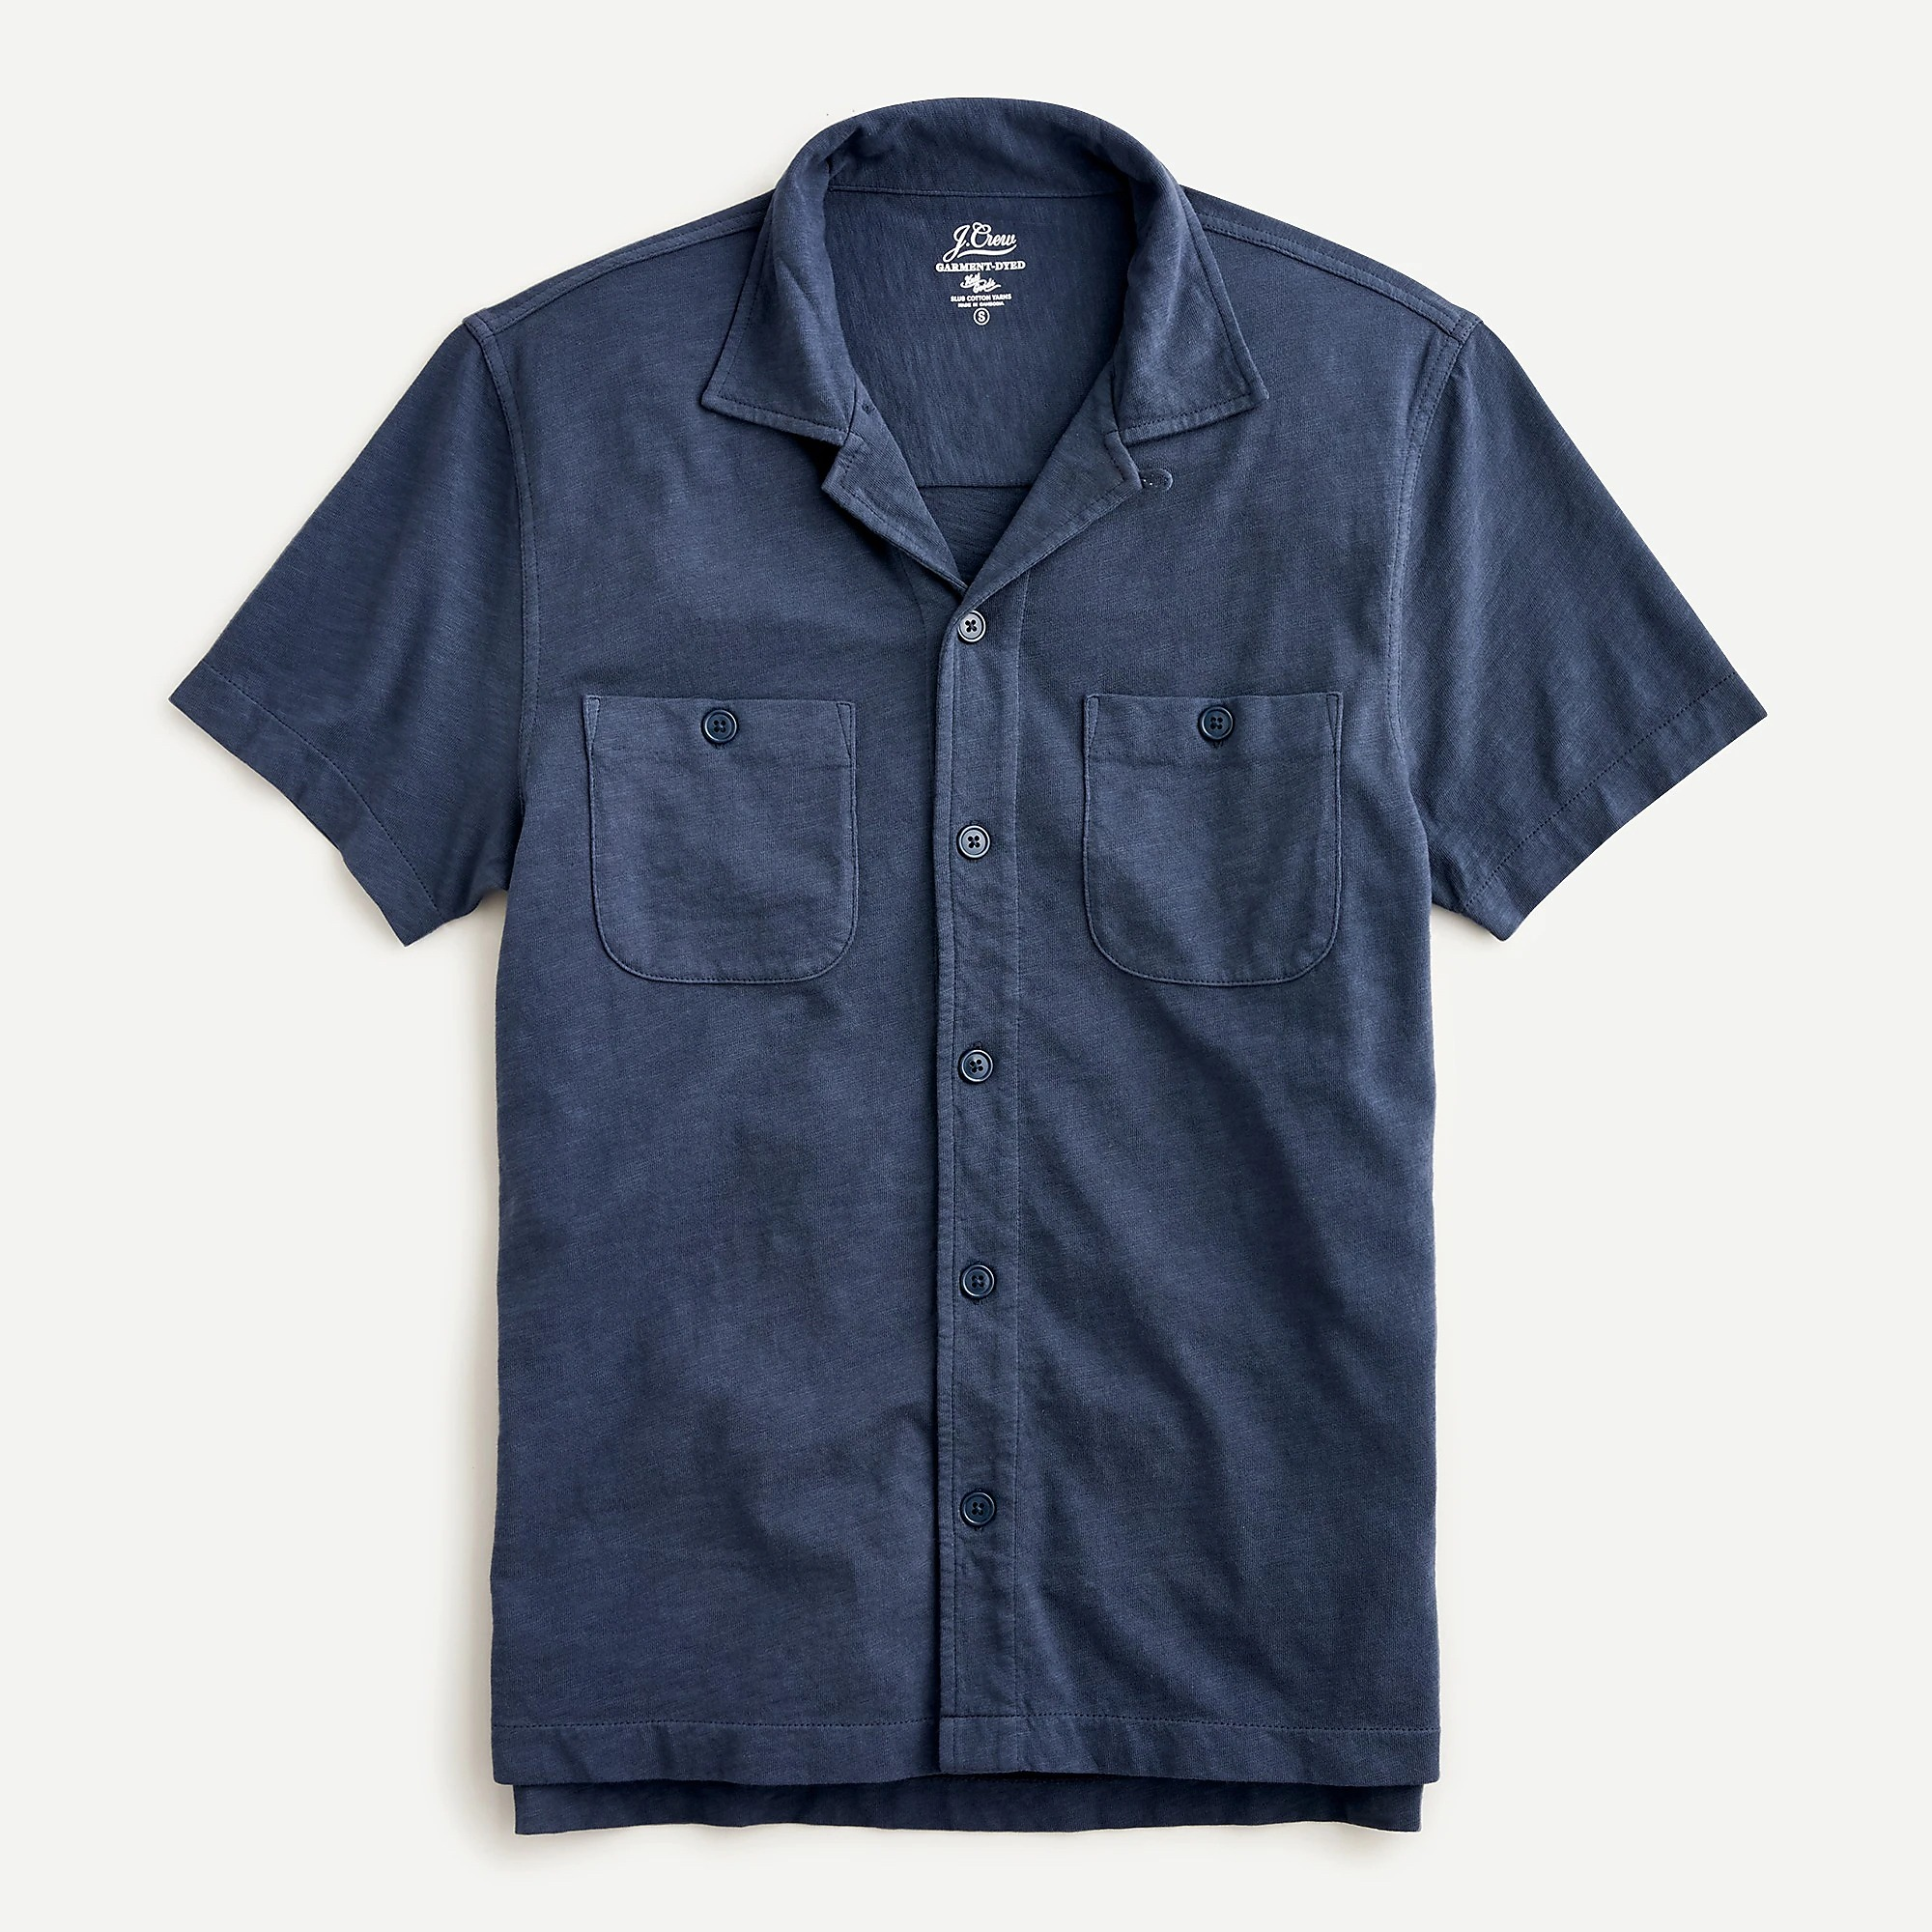 J.Crew Camp Harbor Shirt